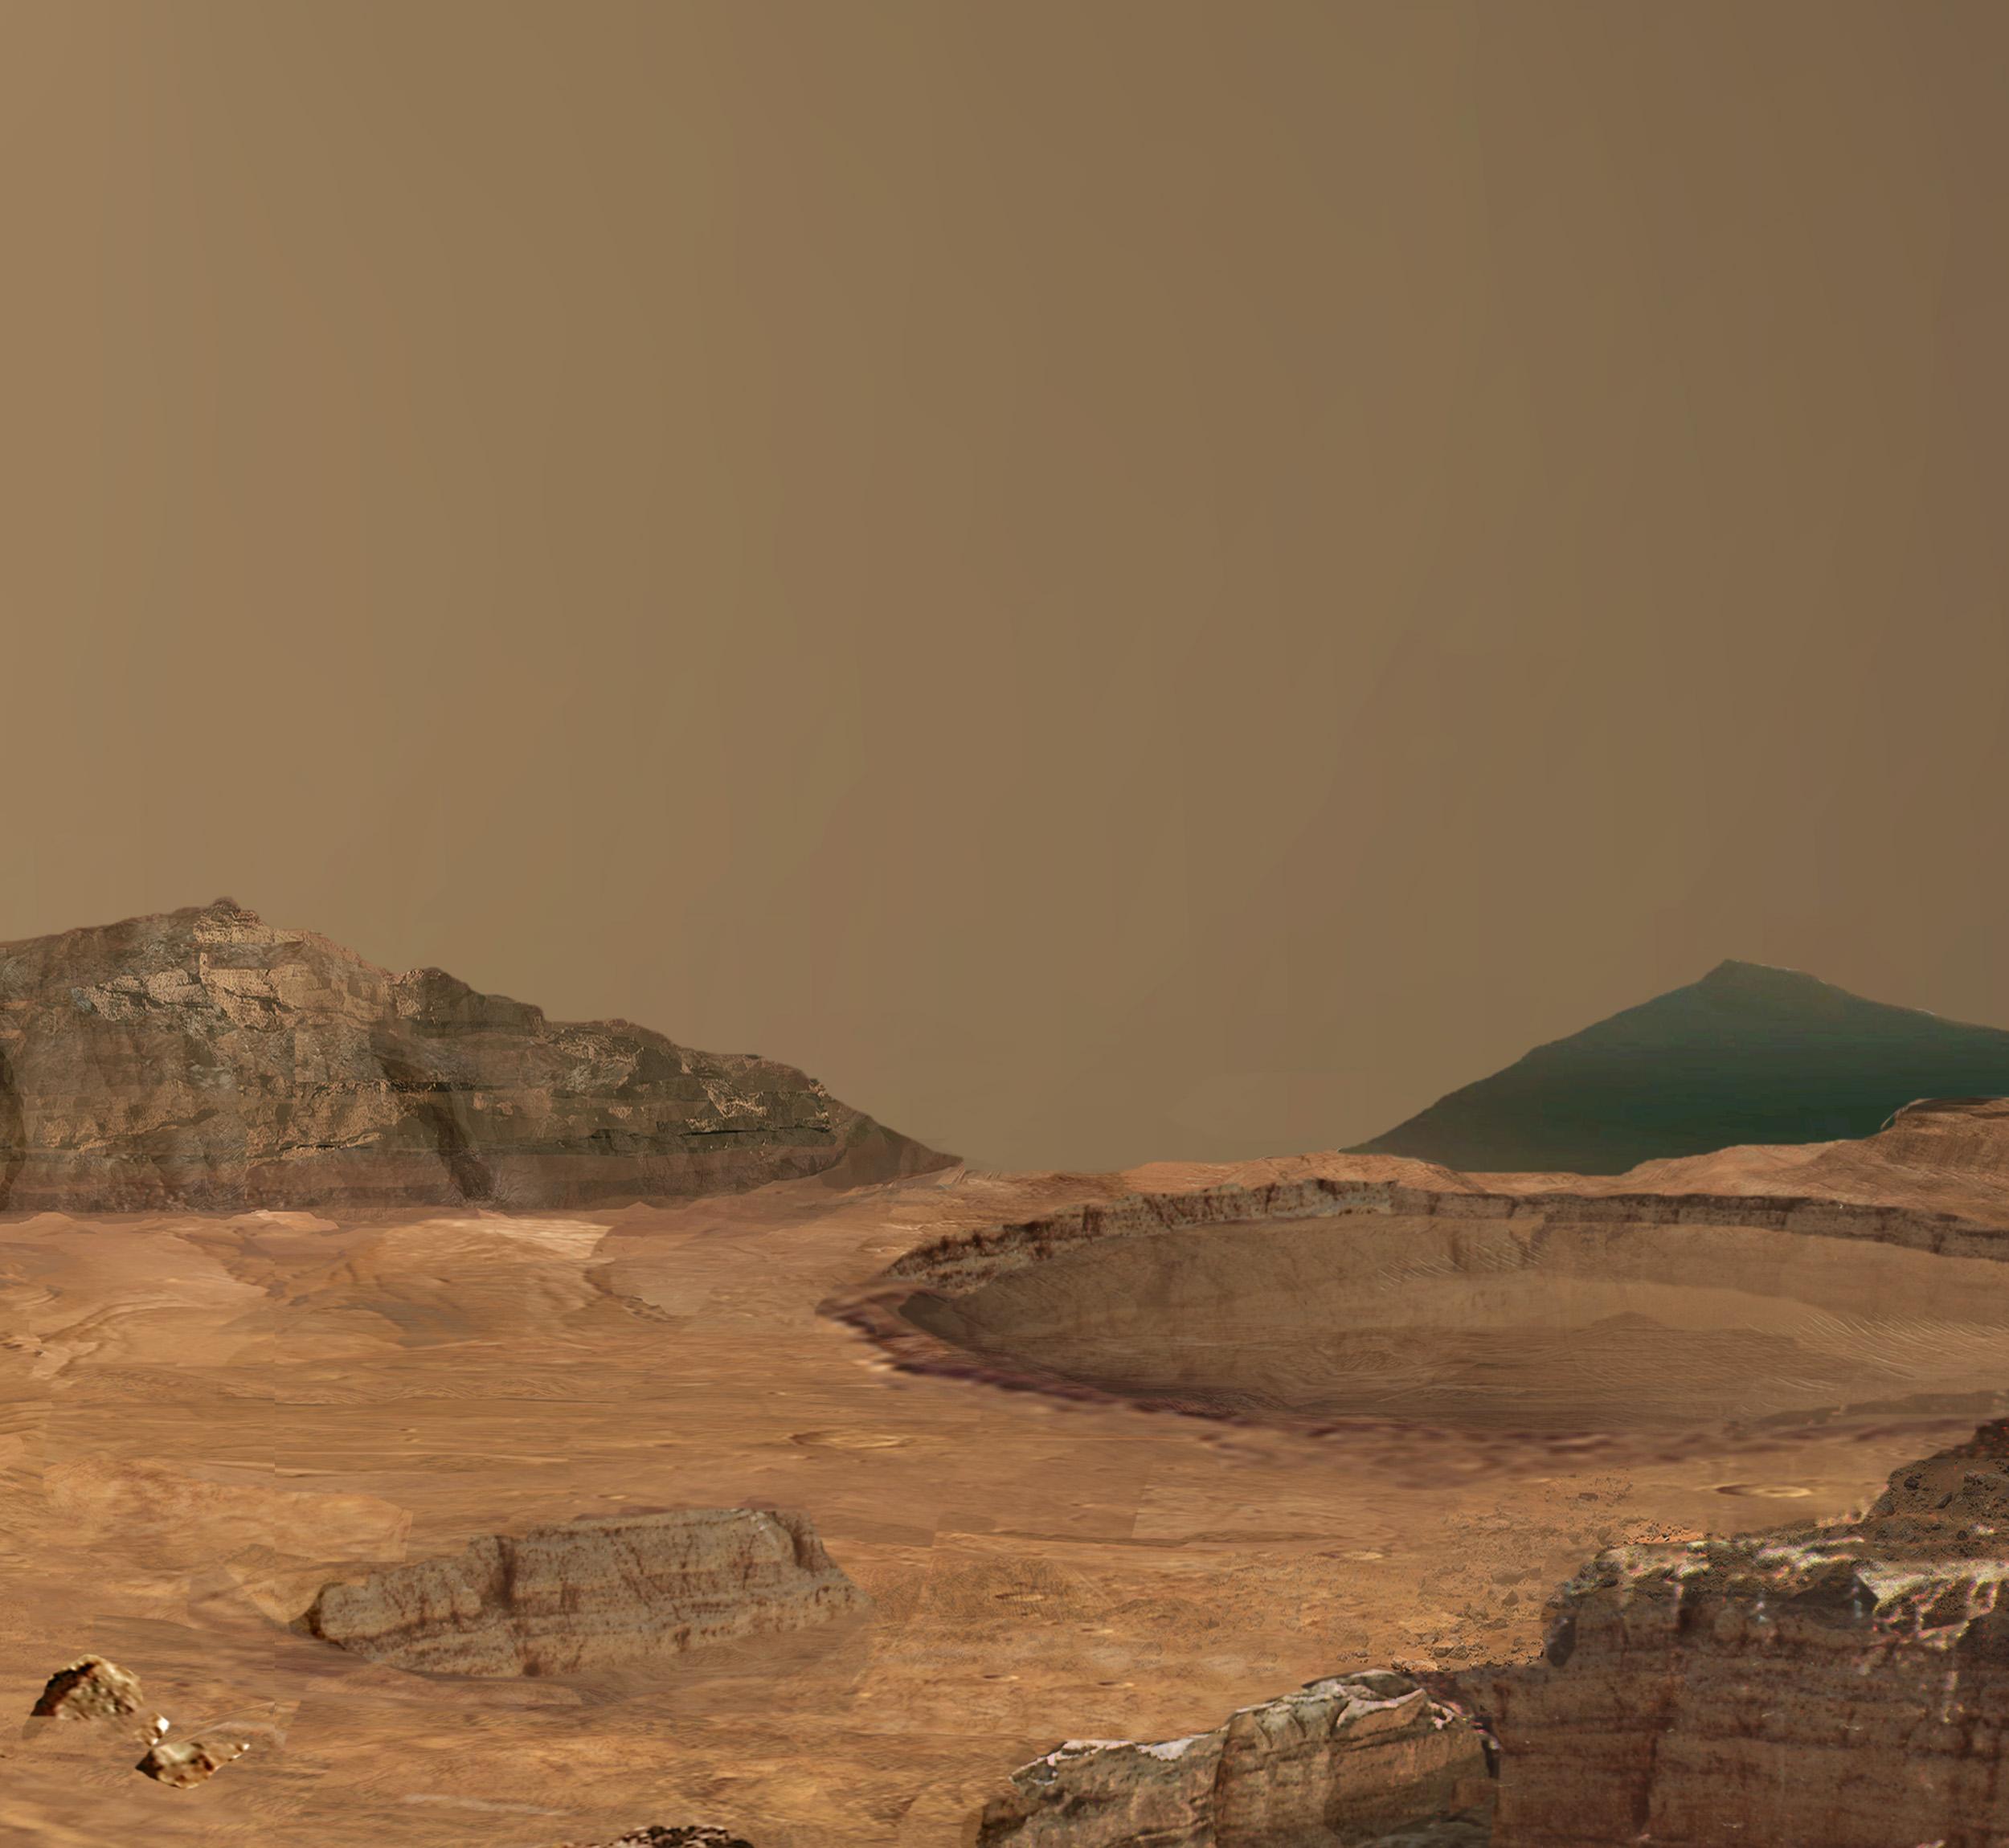 Life on Mars Exploration amp Evidence  Spacecom